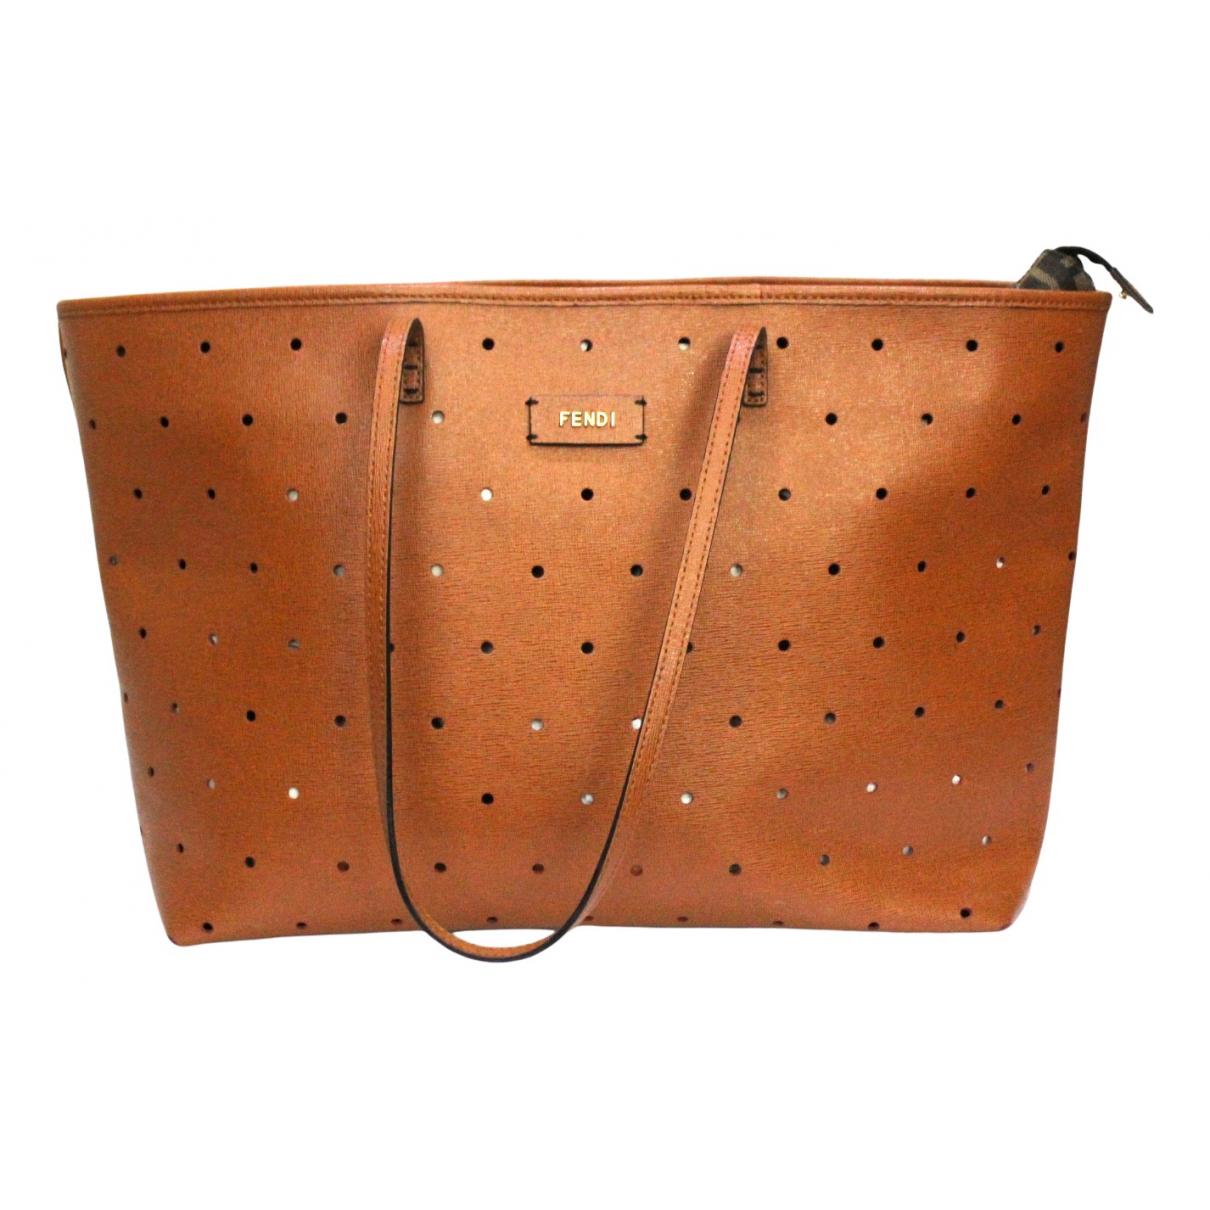 Fendi Roll Bag  Handtasche in  Braun Leder